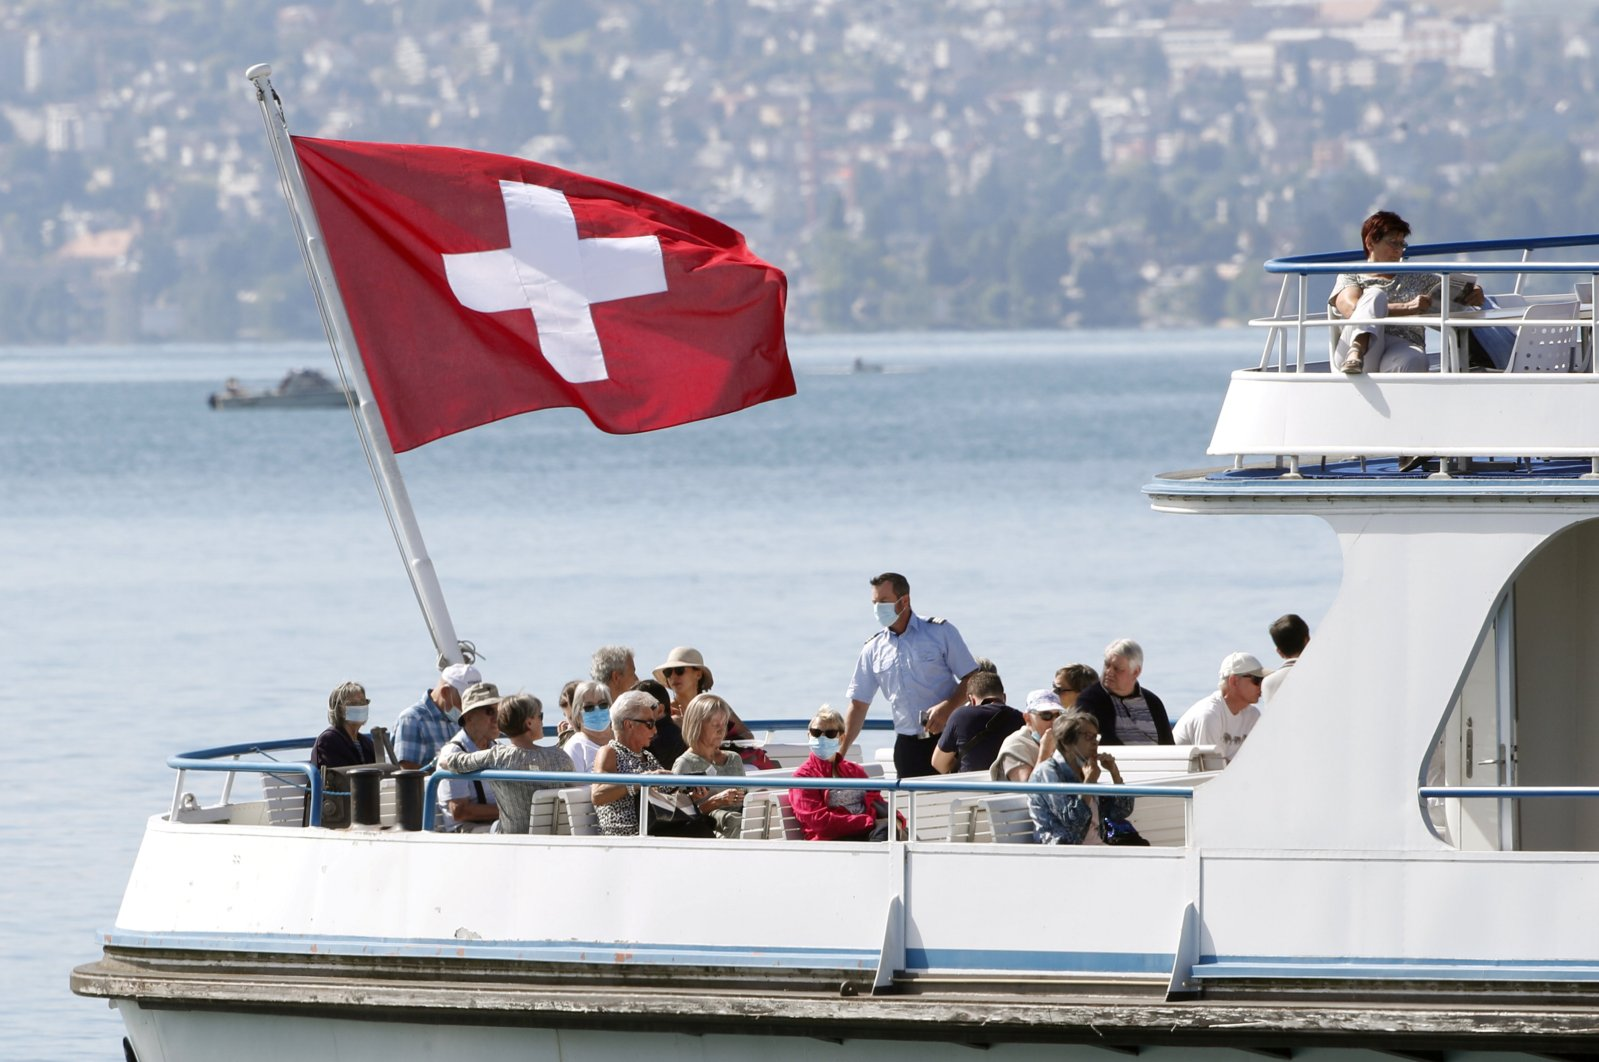 Switzerland's national flag flies above passengers as tourist vessel Limmat sails on Lake Zurich, as the coronavirus disease continues, in Zurich, June 30, 2020. (REUTERS)